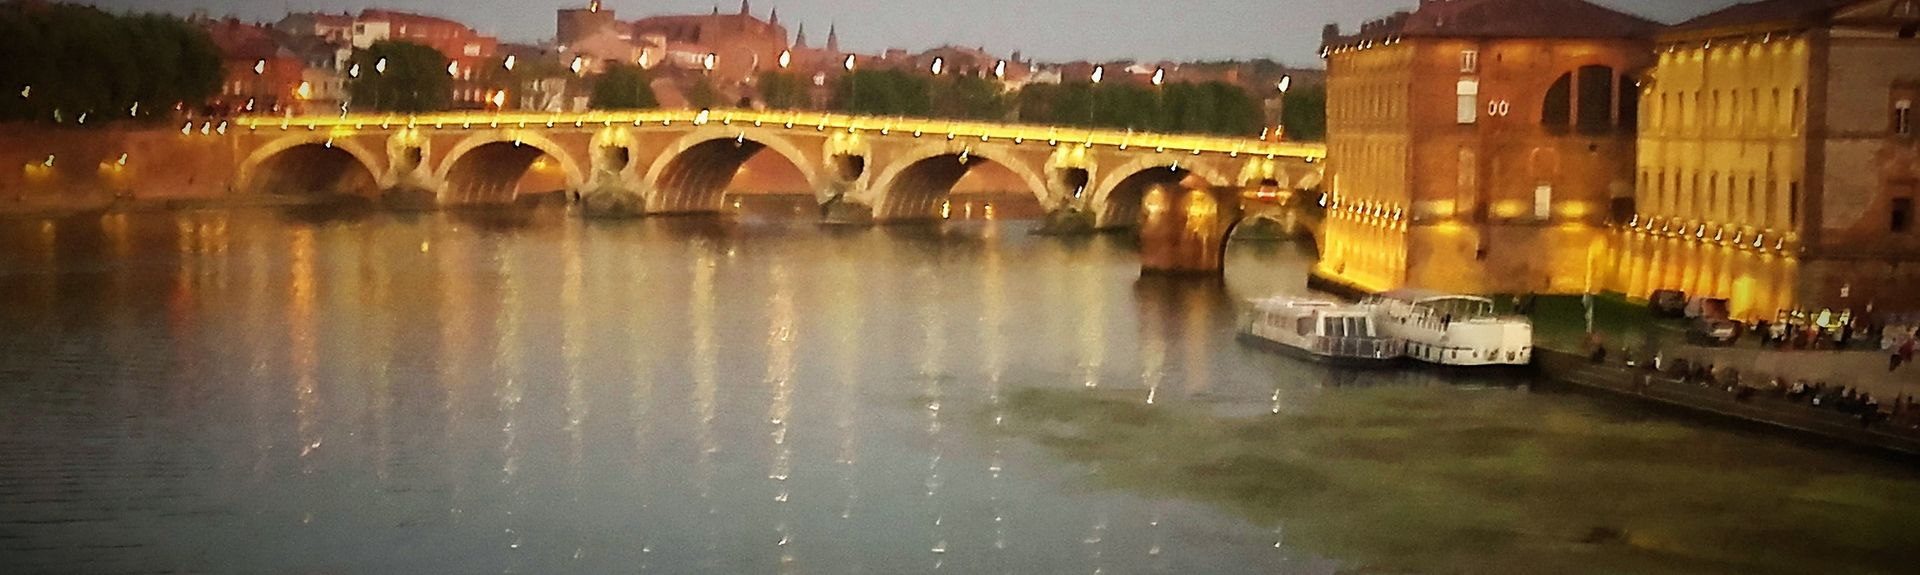 Toulouse, Occitanie, France